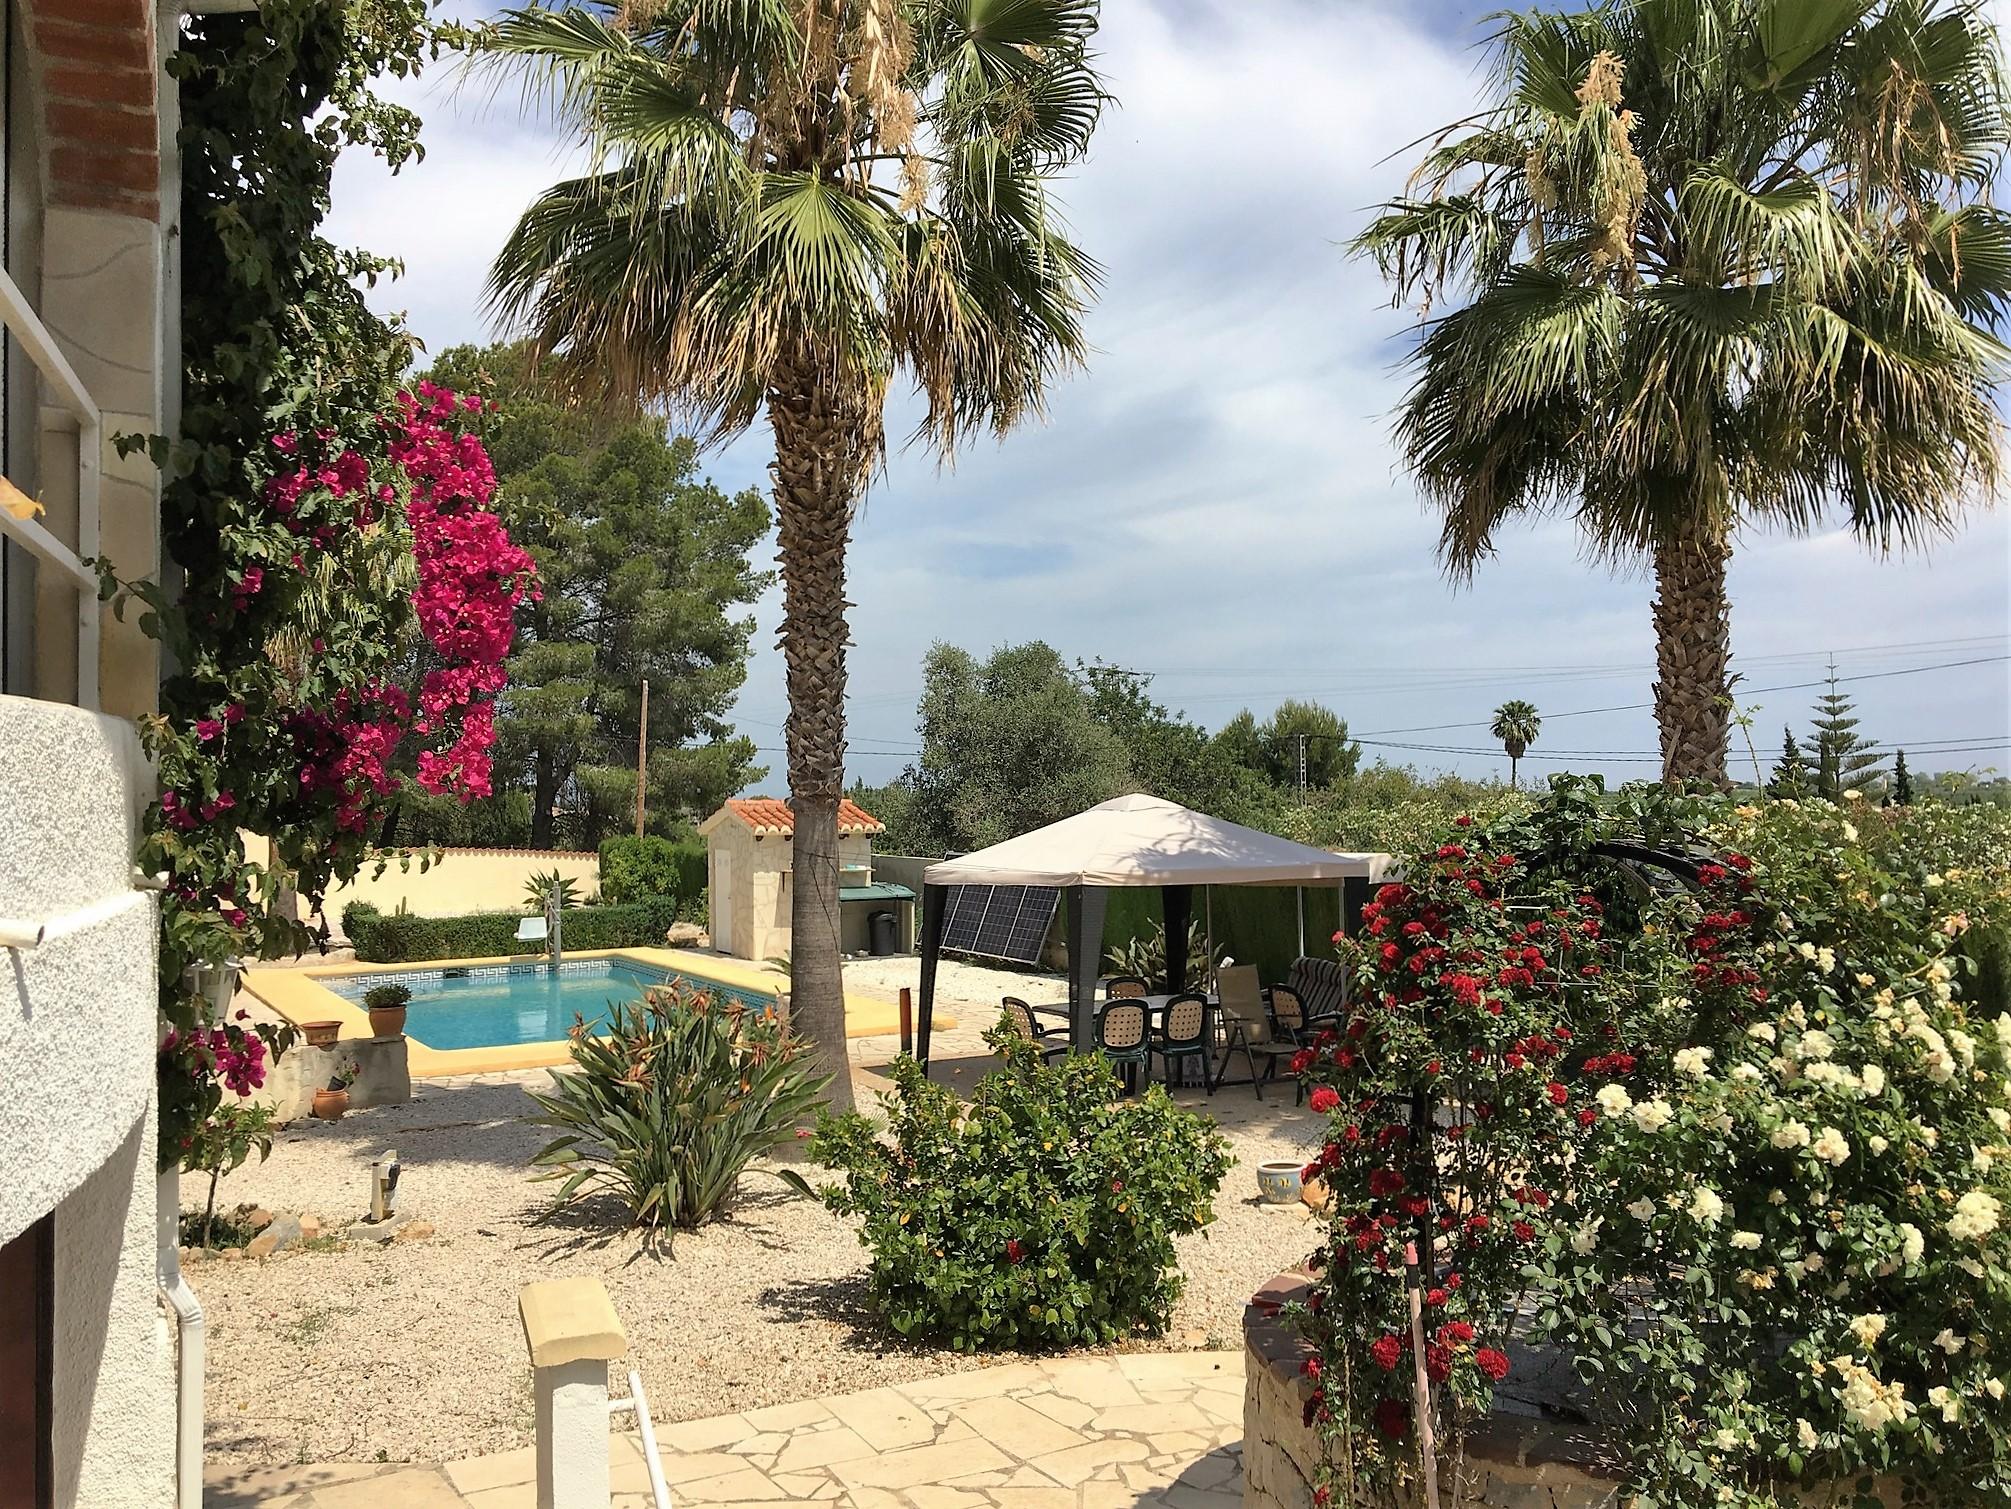 Pflege Costa Blanca - Pflege in Denia